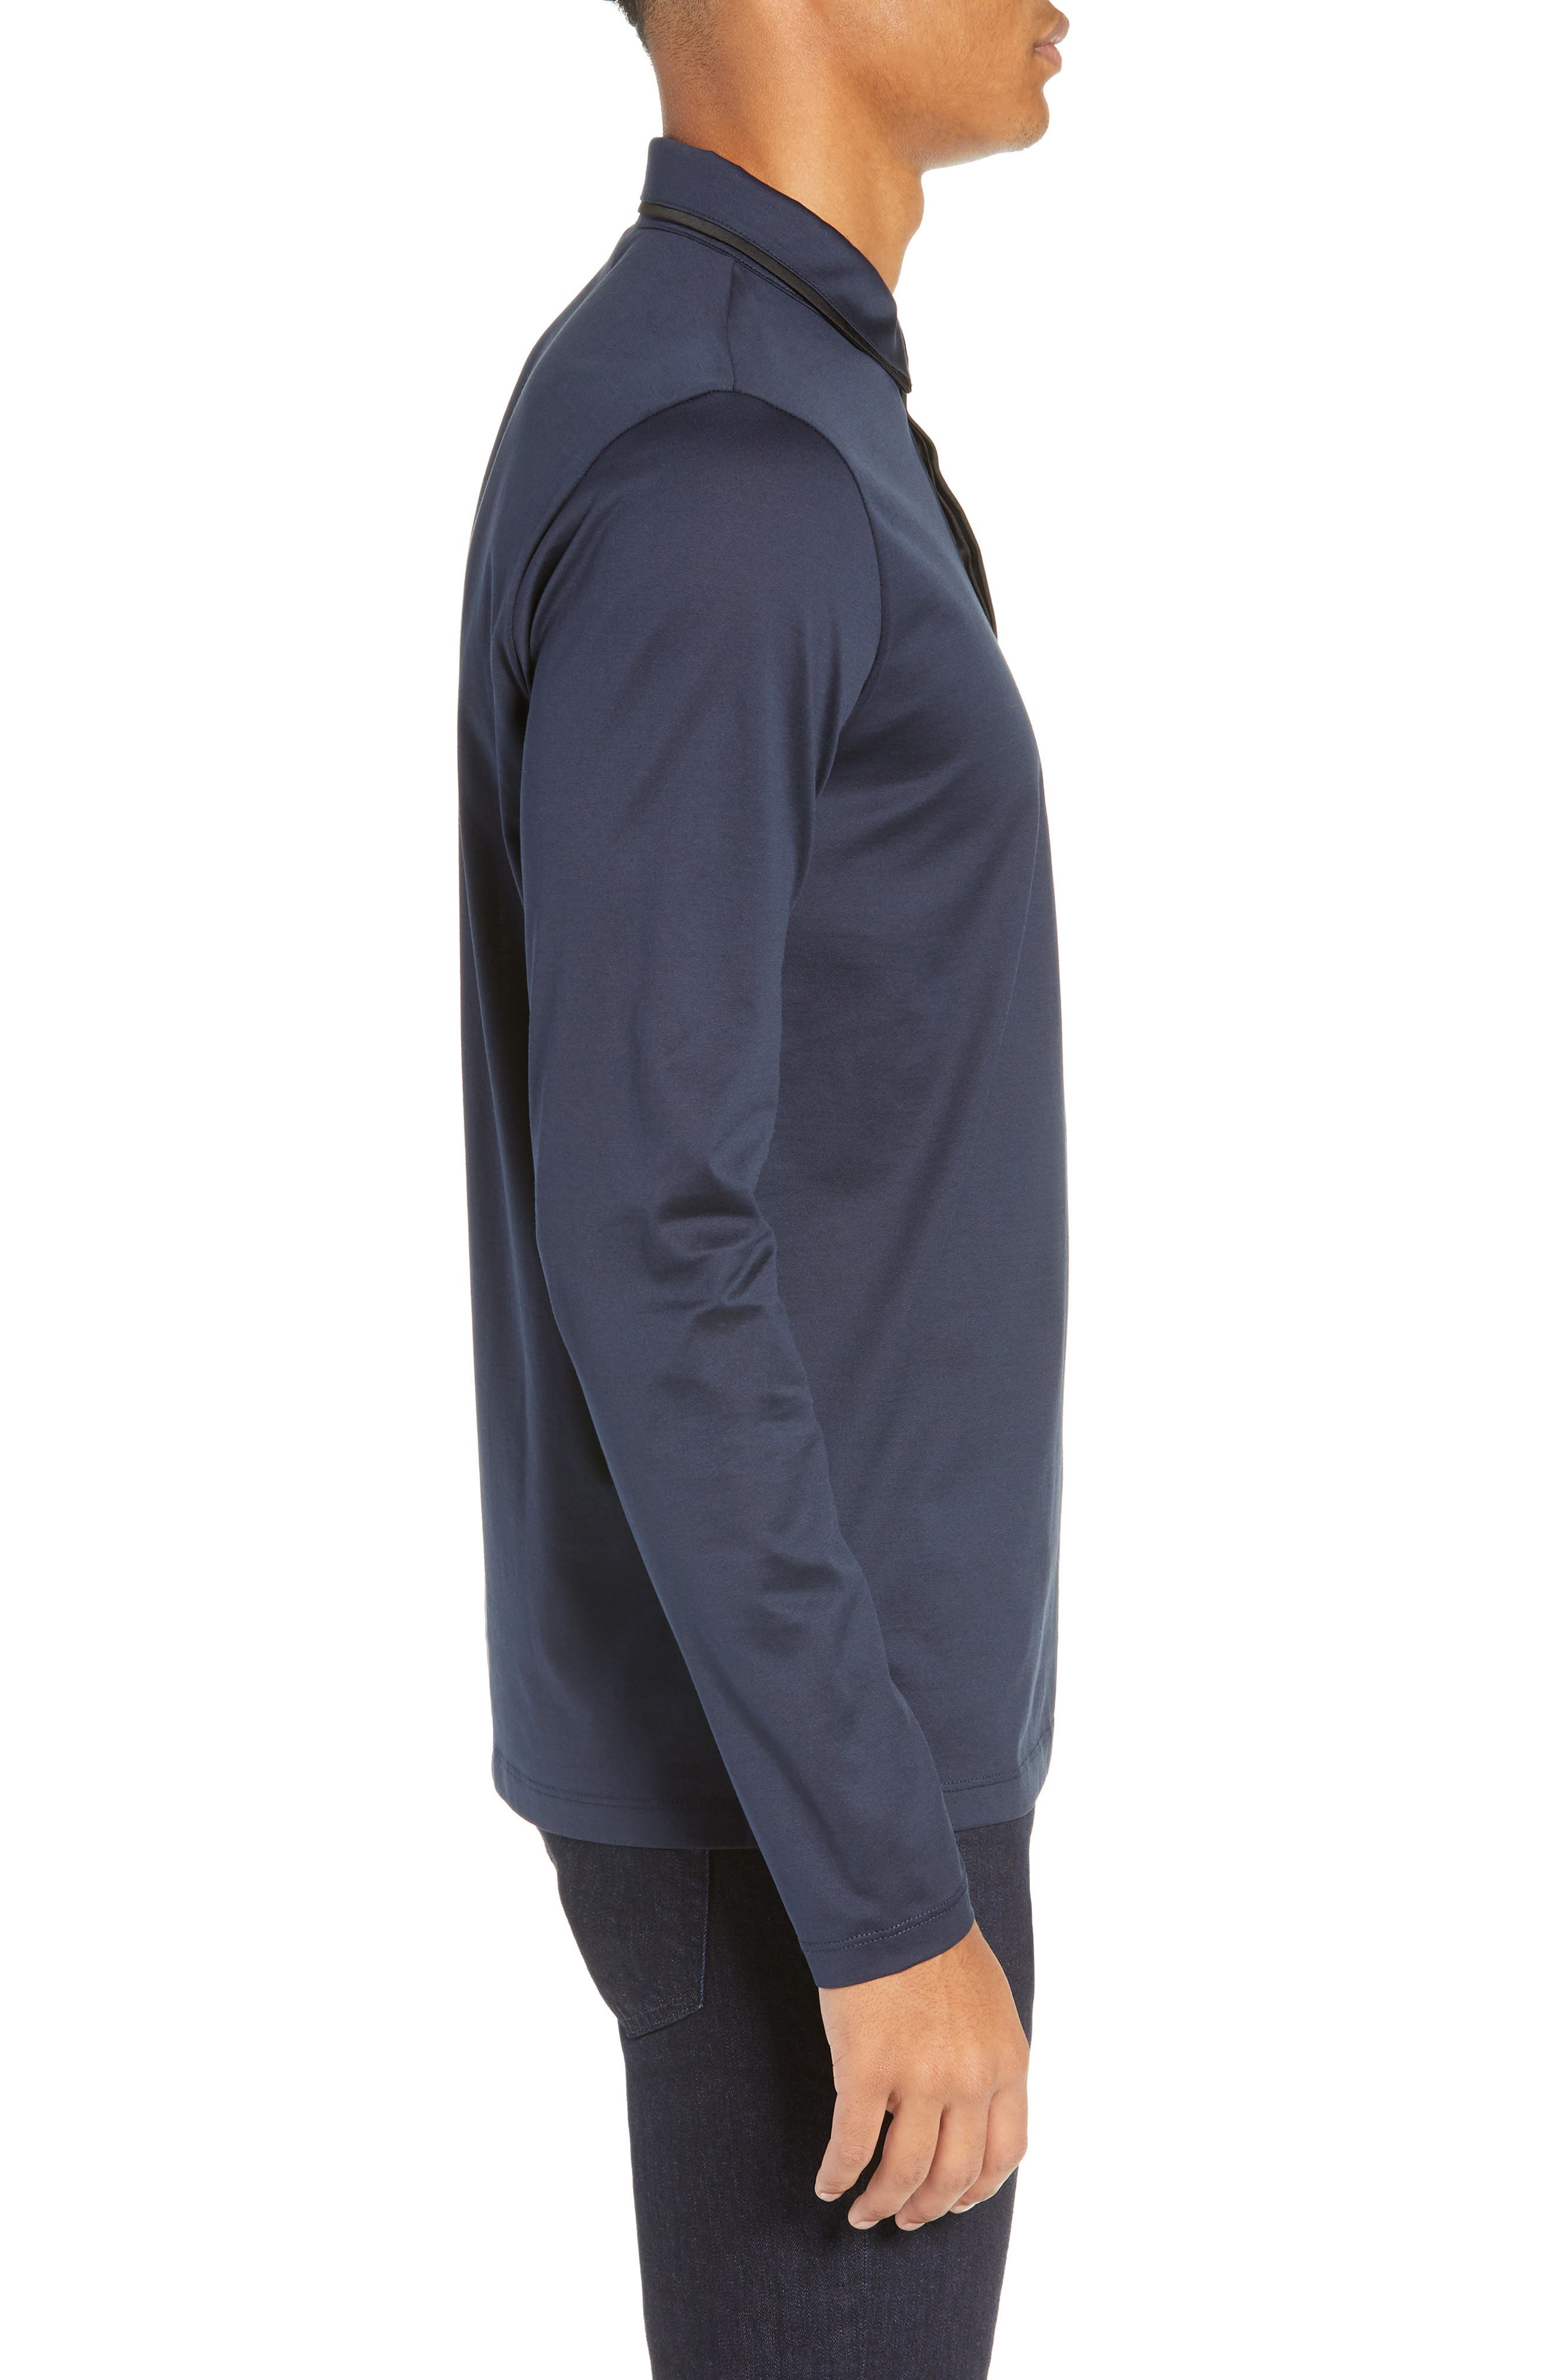 Dalendar Mercerized Cotton Slim Fit Polo Shirt,                             Alternate thumbnail 3, color,                             BLUE